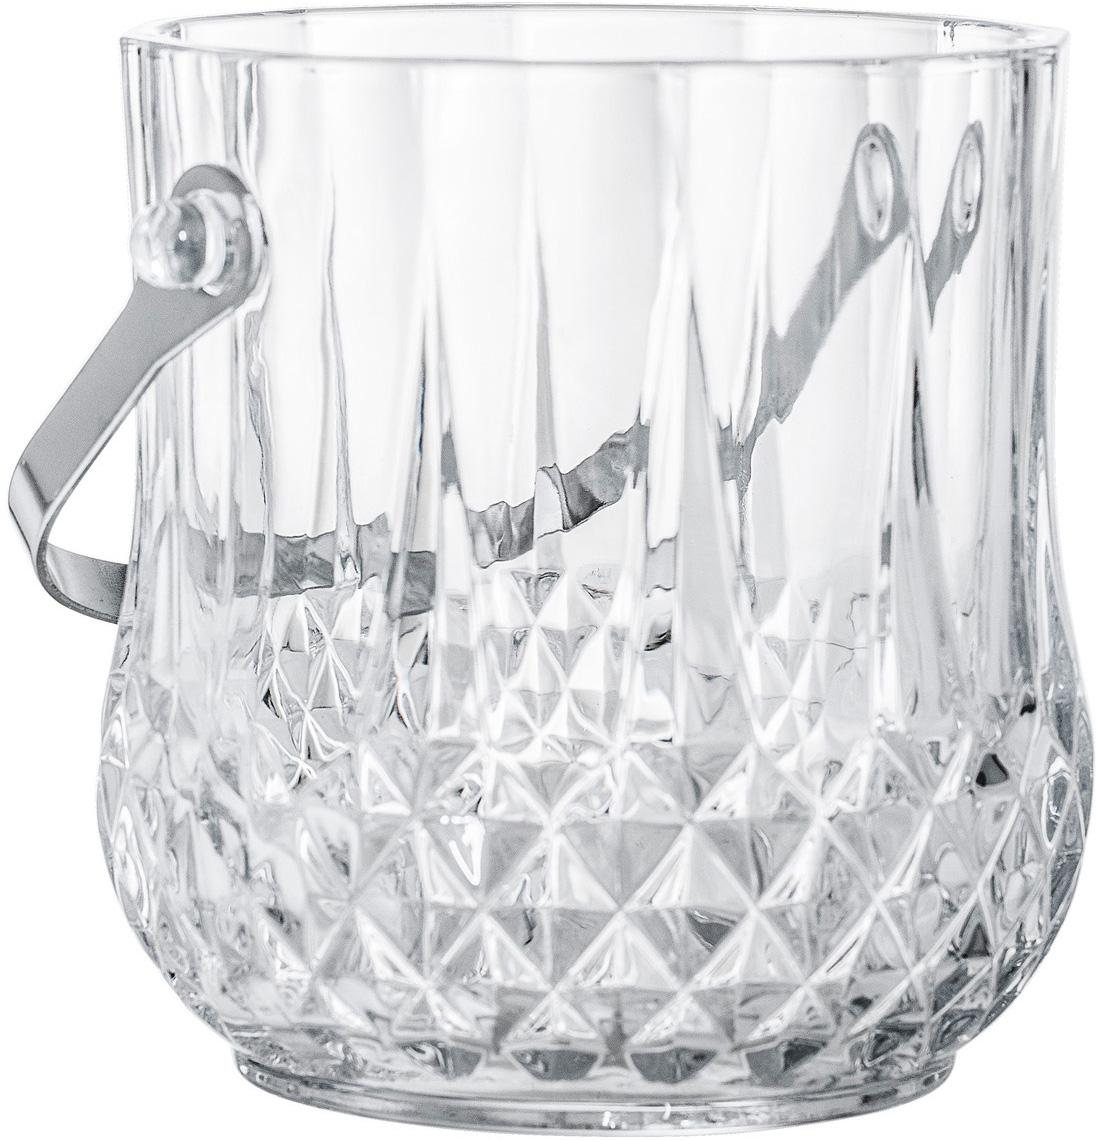 Eiseimer Julie, Henkel: Edelstahl, Transparent, Edelstahl, Ø 12 x H 14 cm